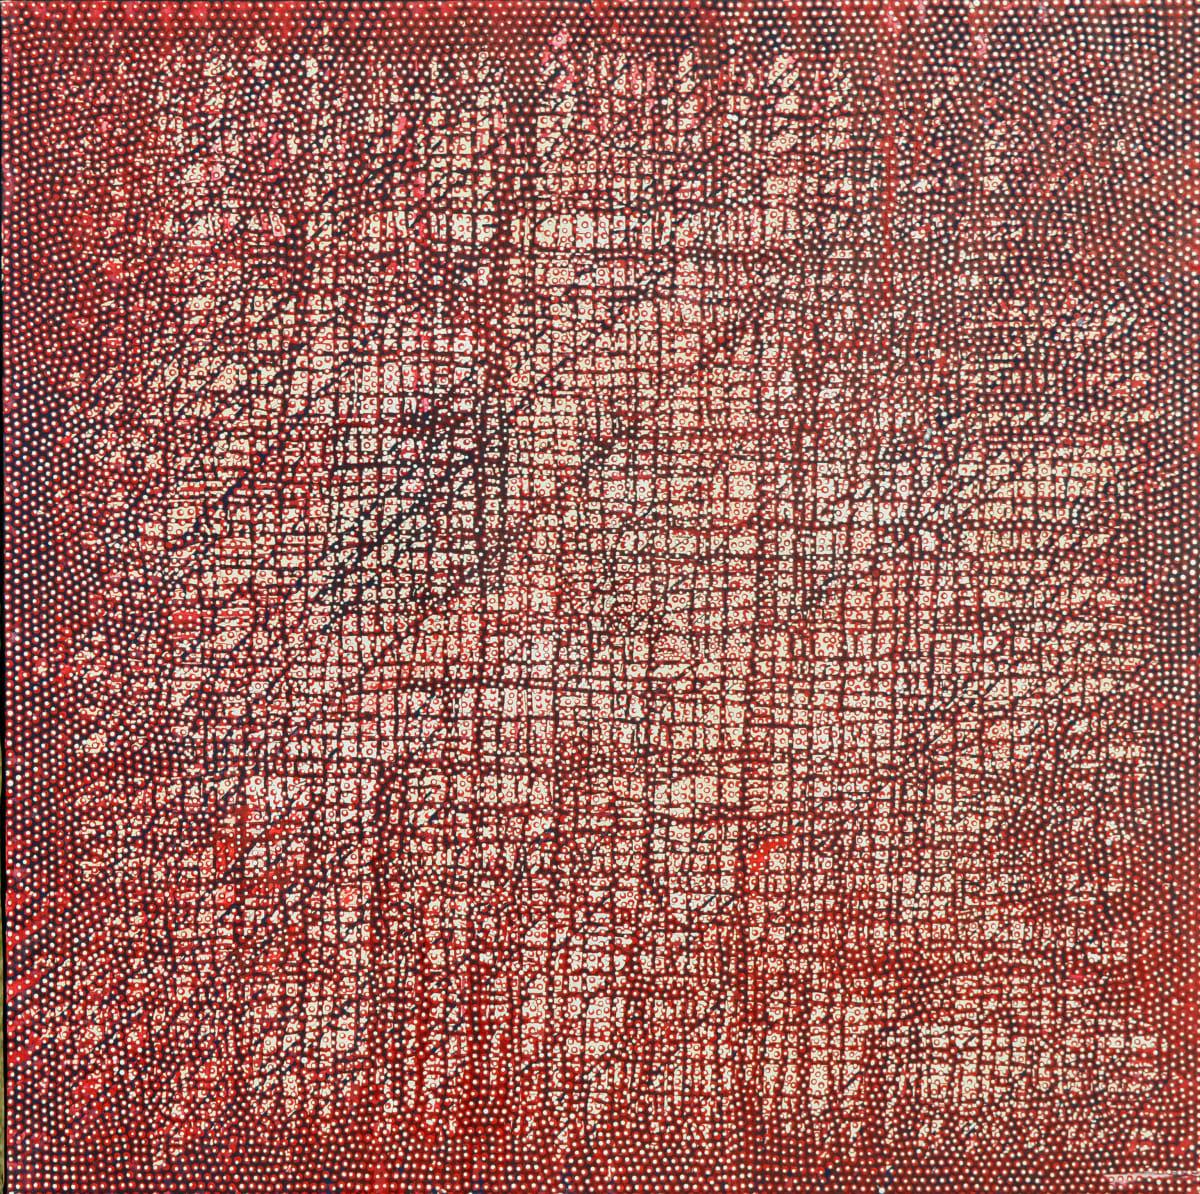 Robert Fielding Milkali Kutju acrylic on linen 122 x 122 cm